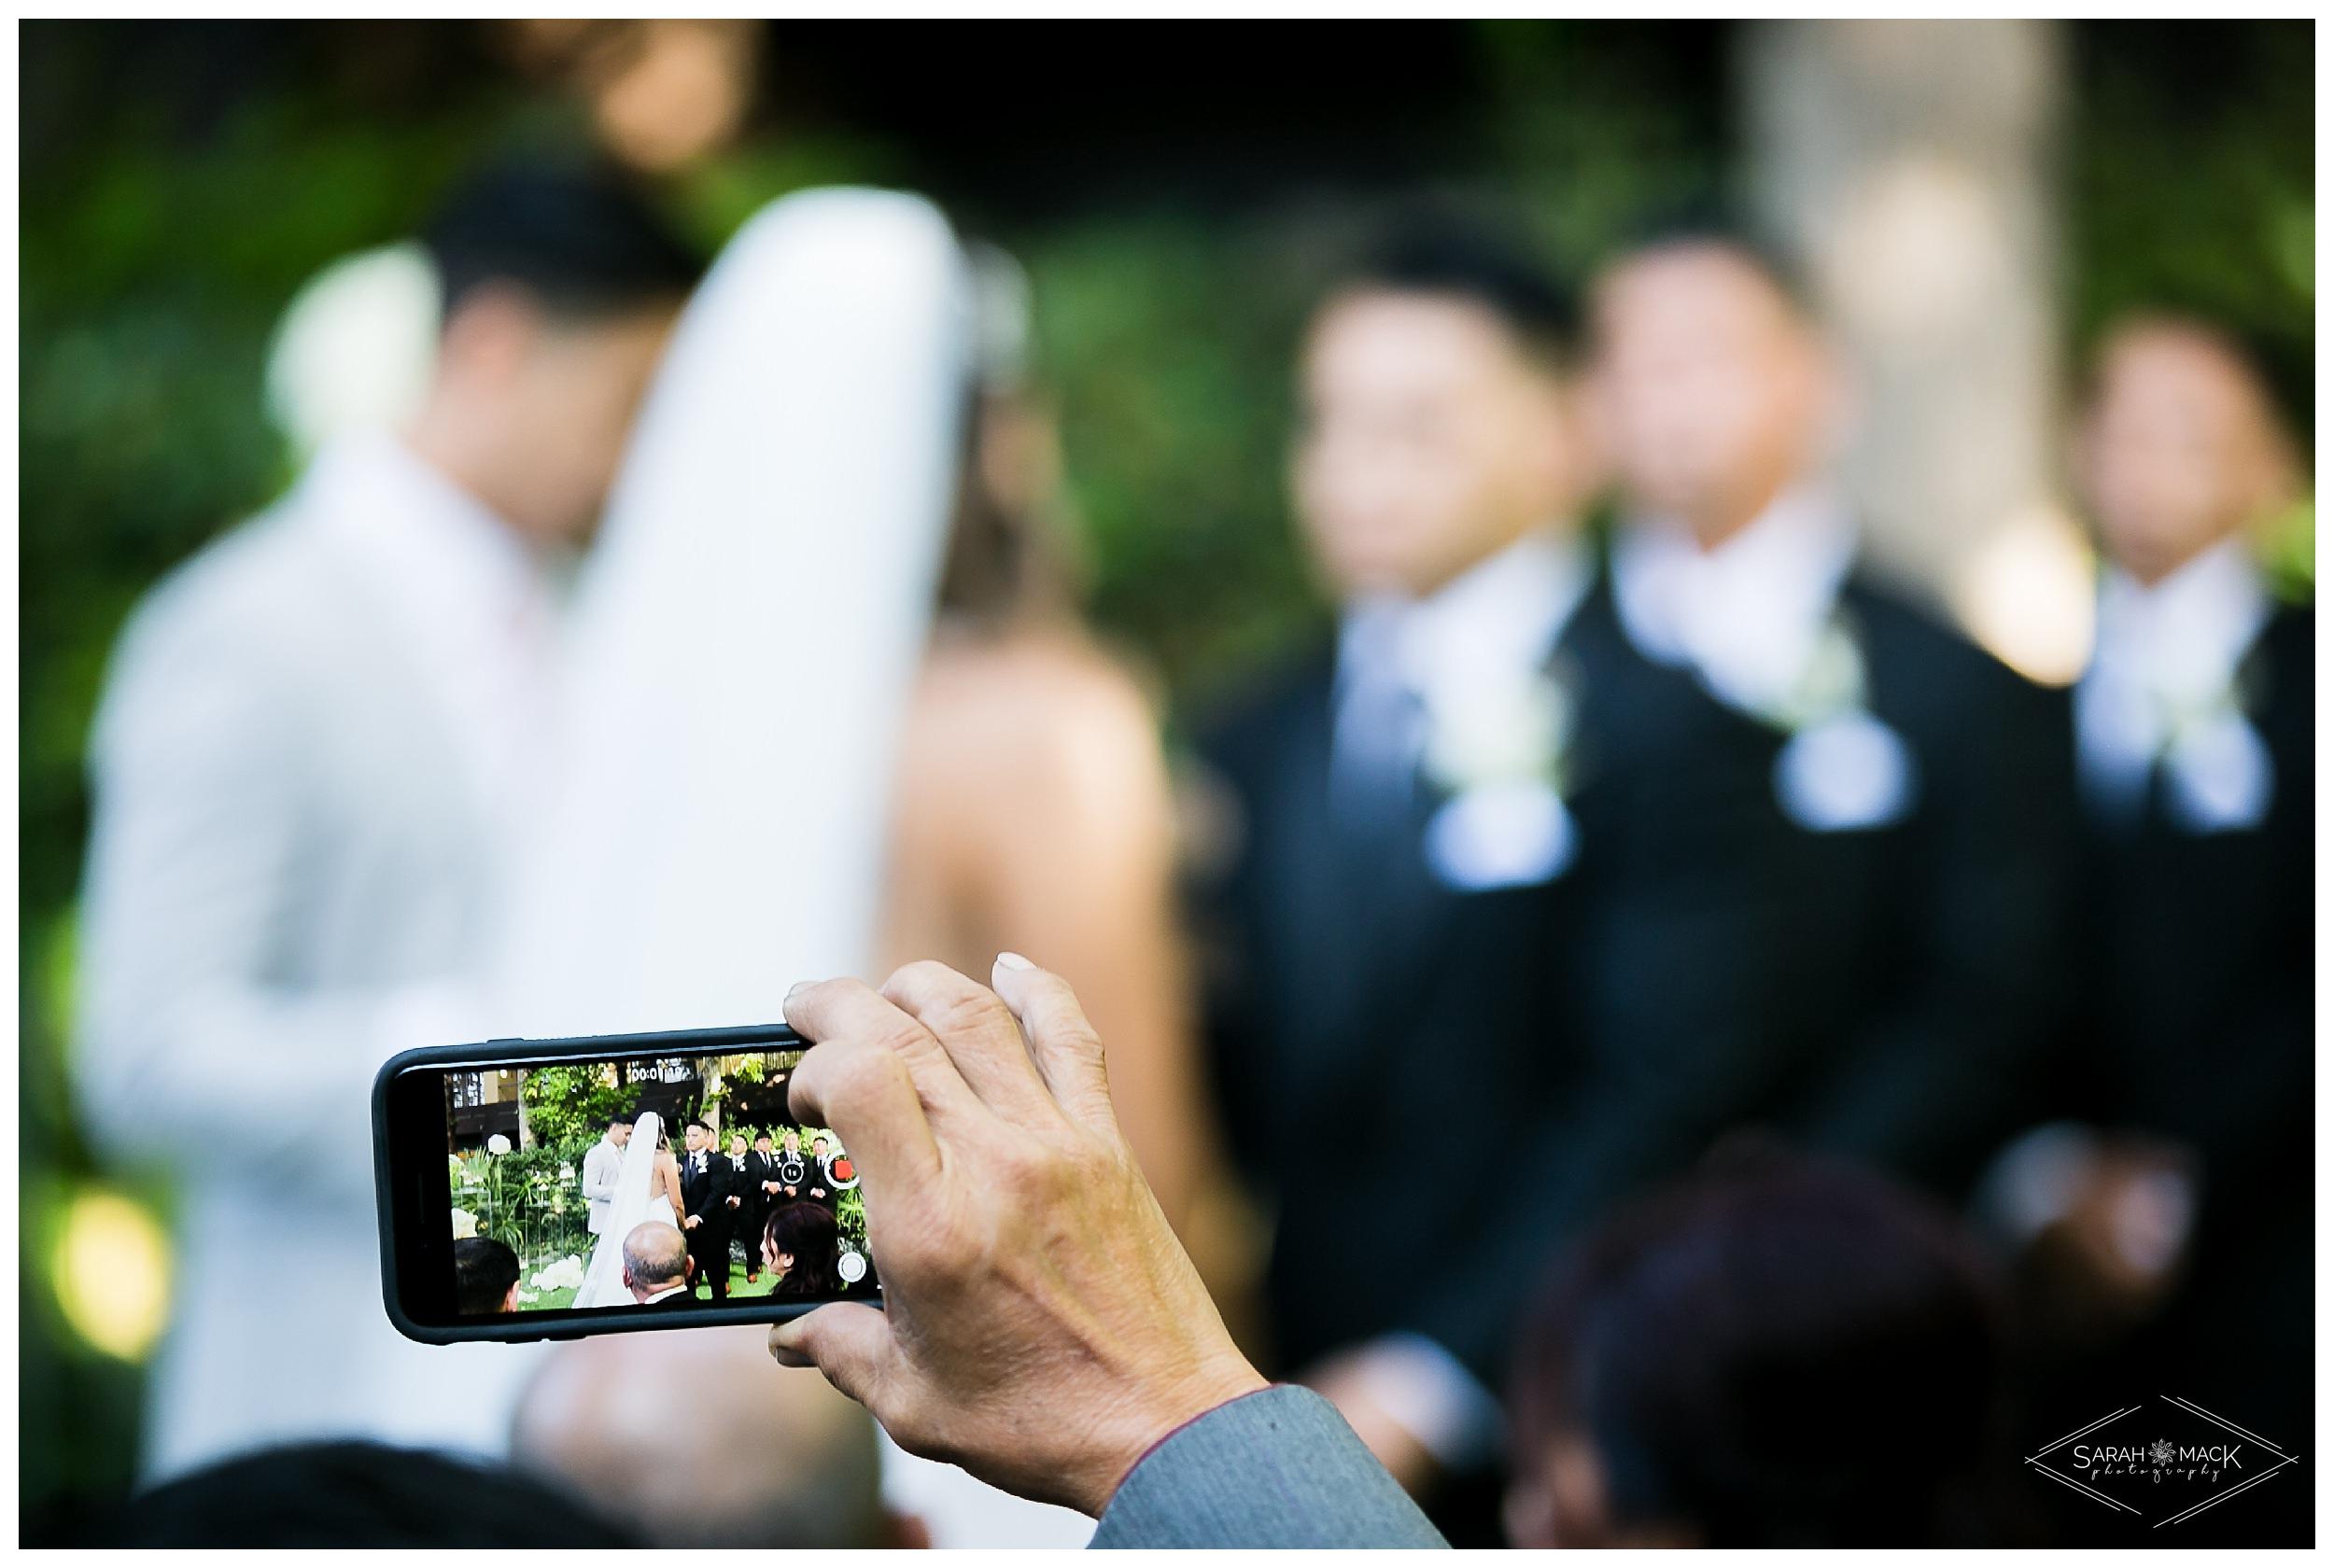 LE-Avenue-of-the-Arts-Costa-Mesa-Wedding-Photography-0147.jpg